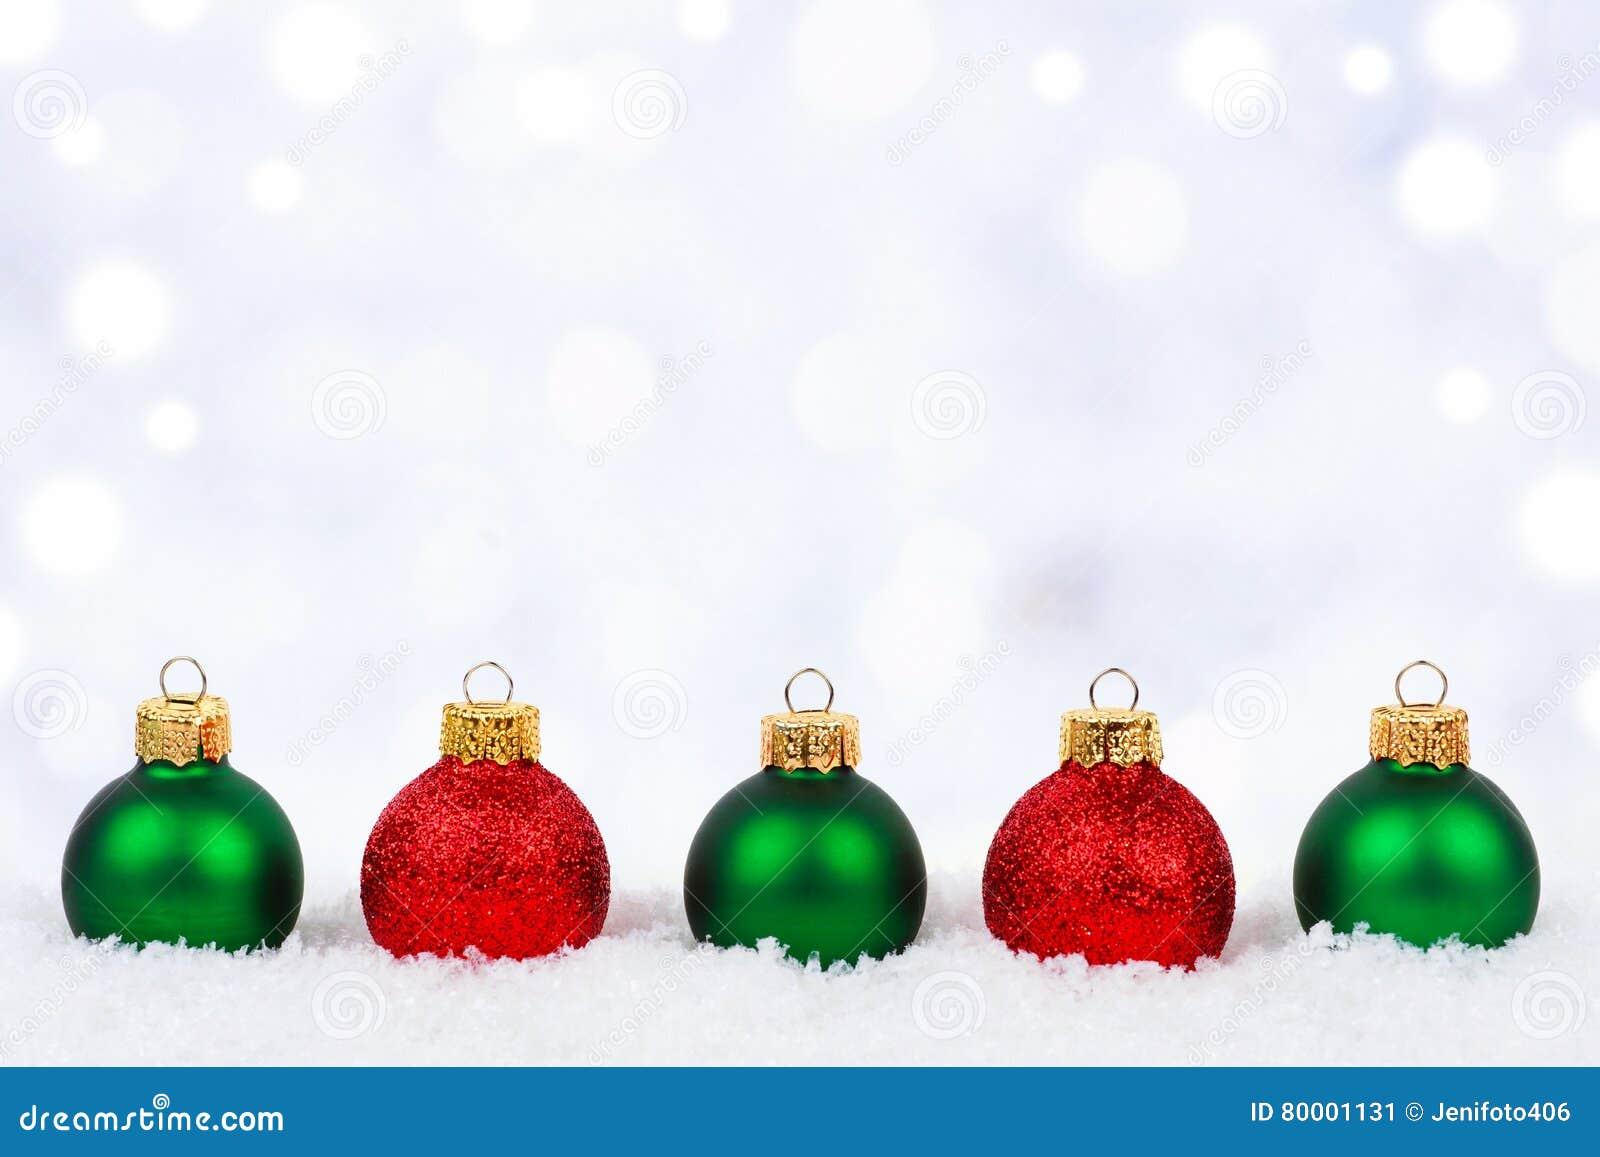 christmas ornaments wallpaper 8026 - photo #23